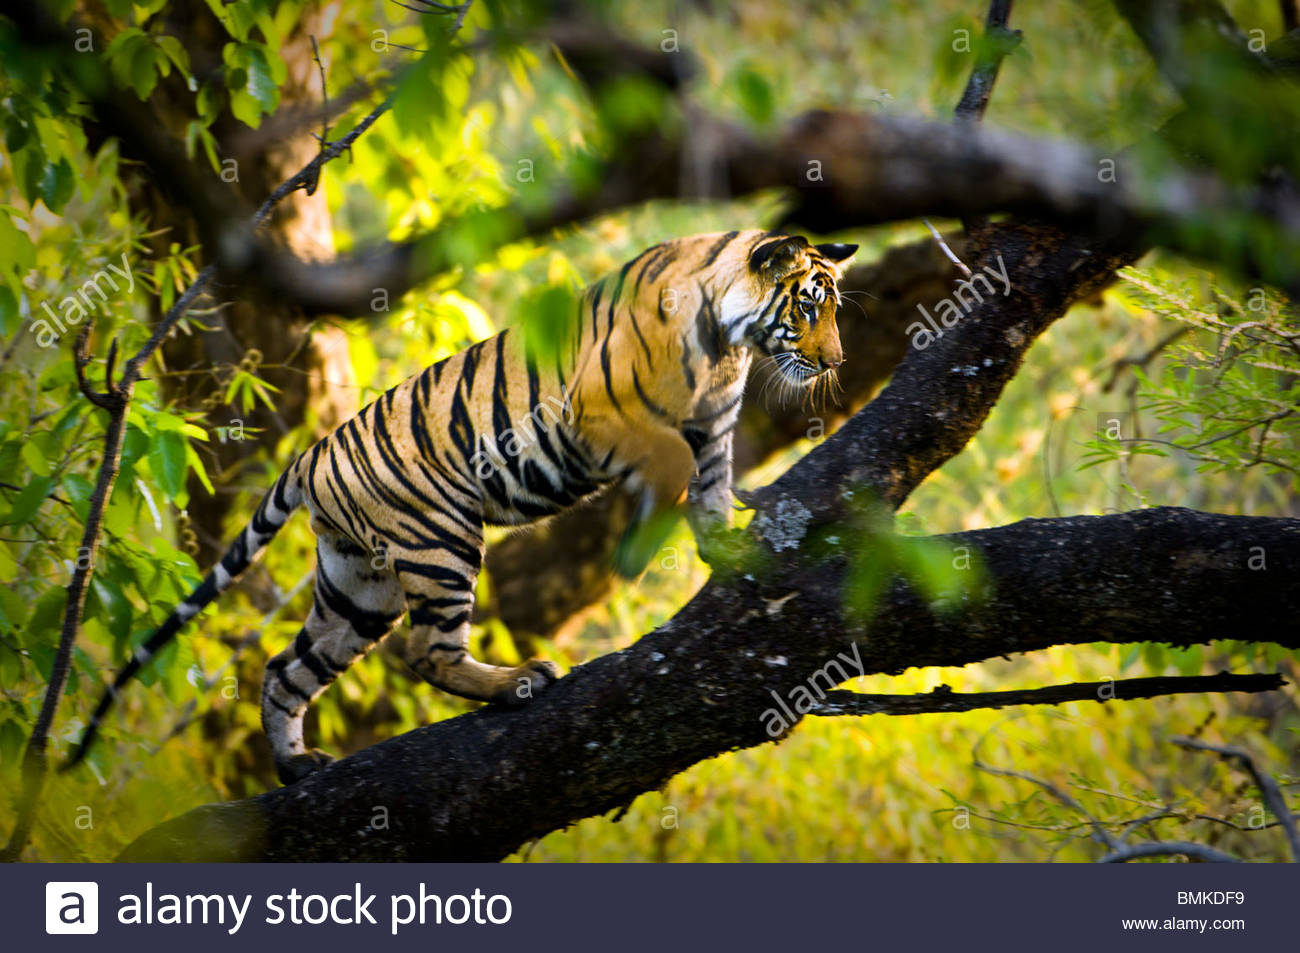 Adolescente varón Tigre de Bengala (aproximadamente 15 meses) subir a un árbol. Bandhavgarh NP, Madhya Imagen De Stock